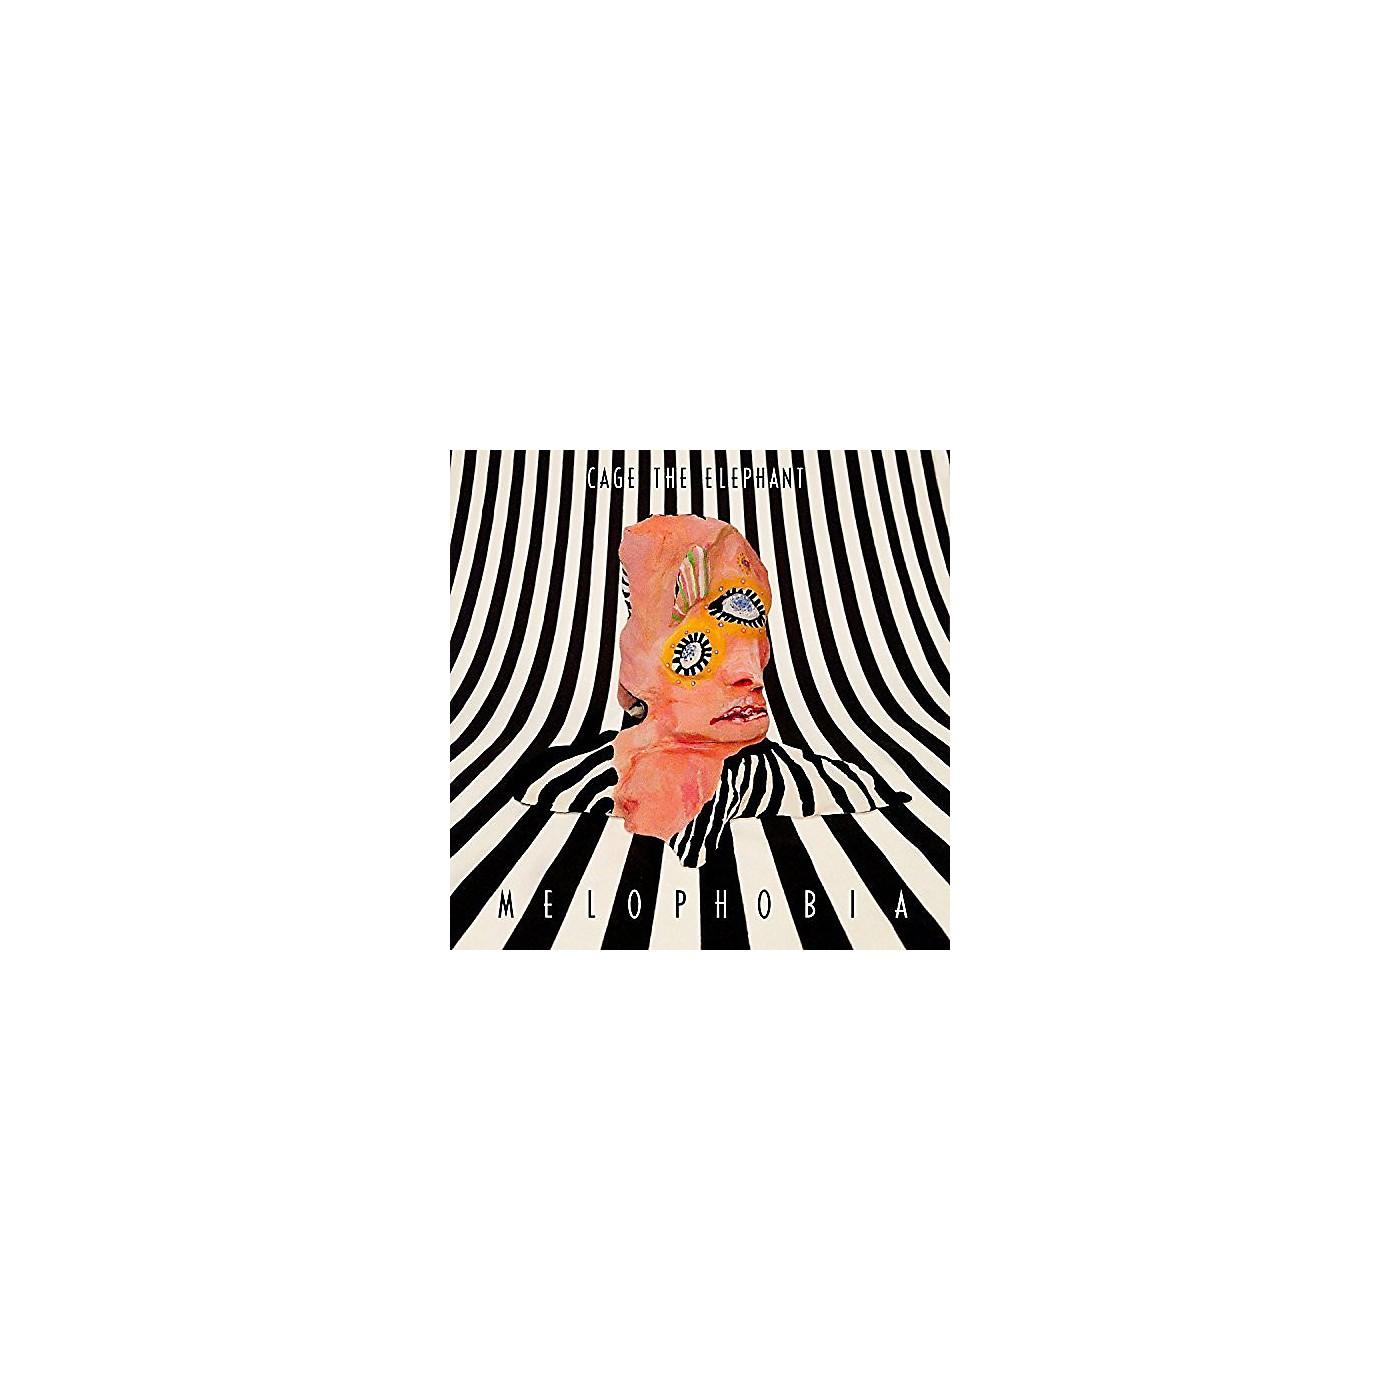 Alliance Cage the Elephant - Melophobia (Vinyl) thumbnail